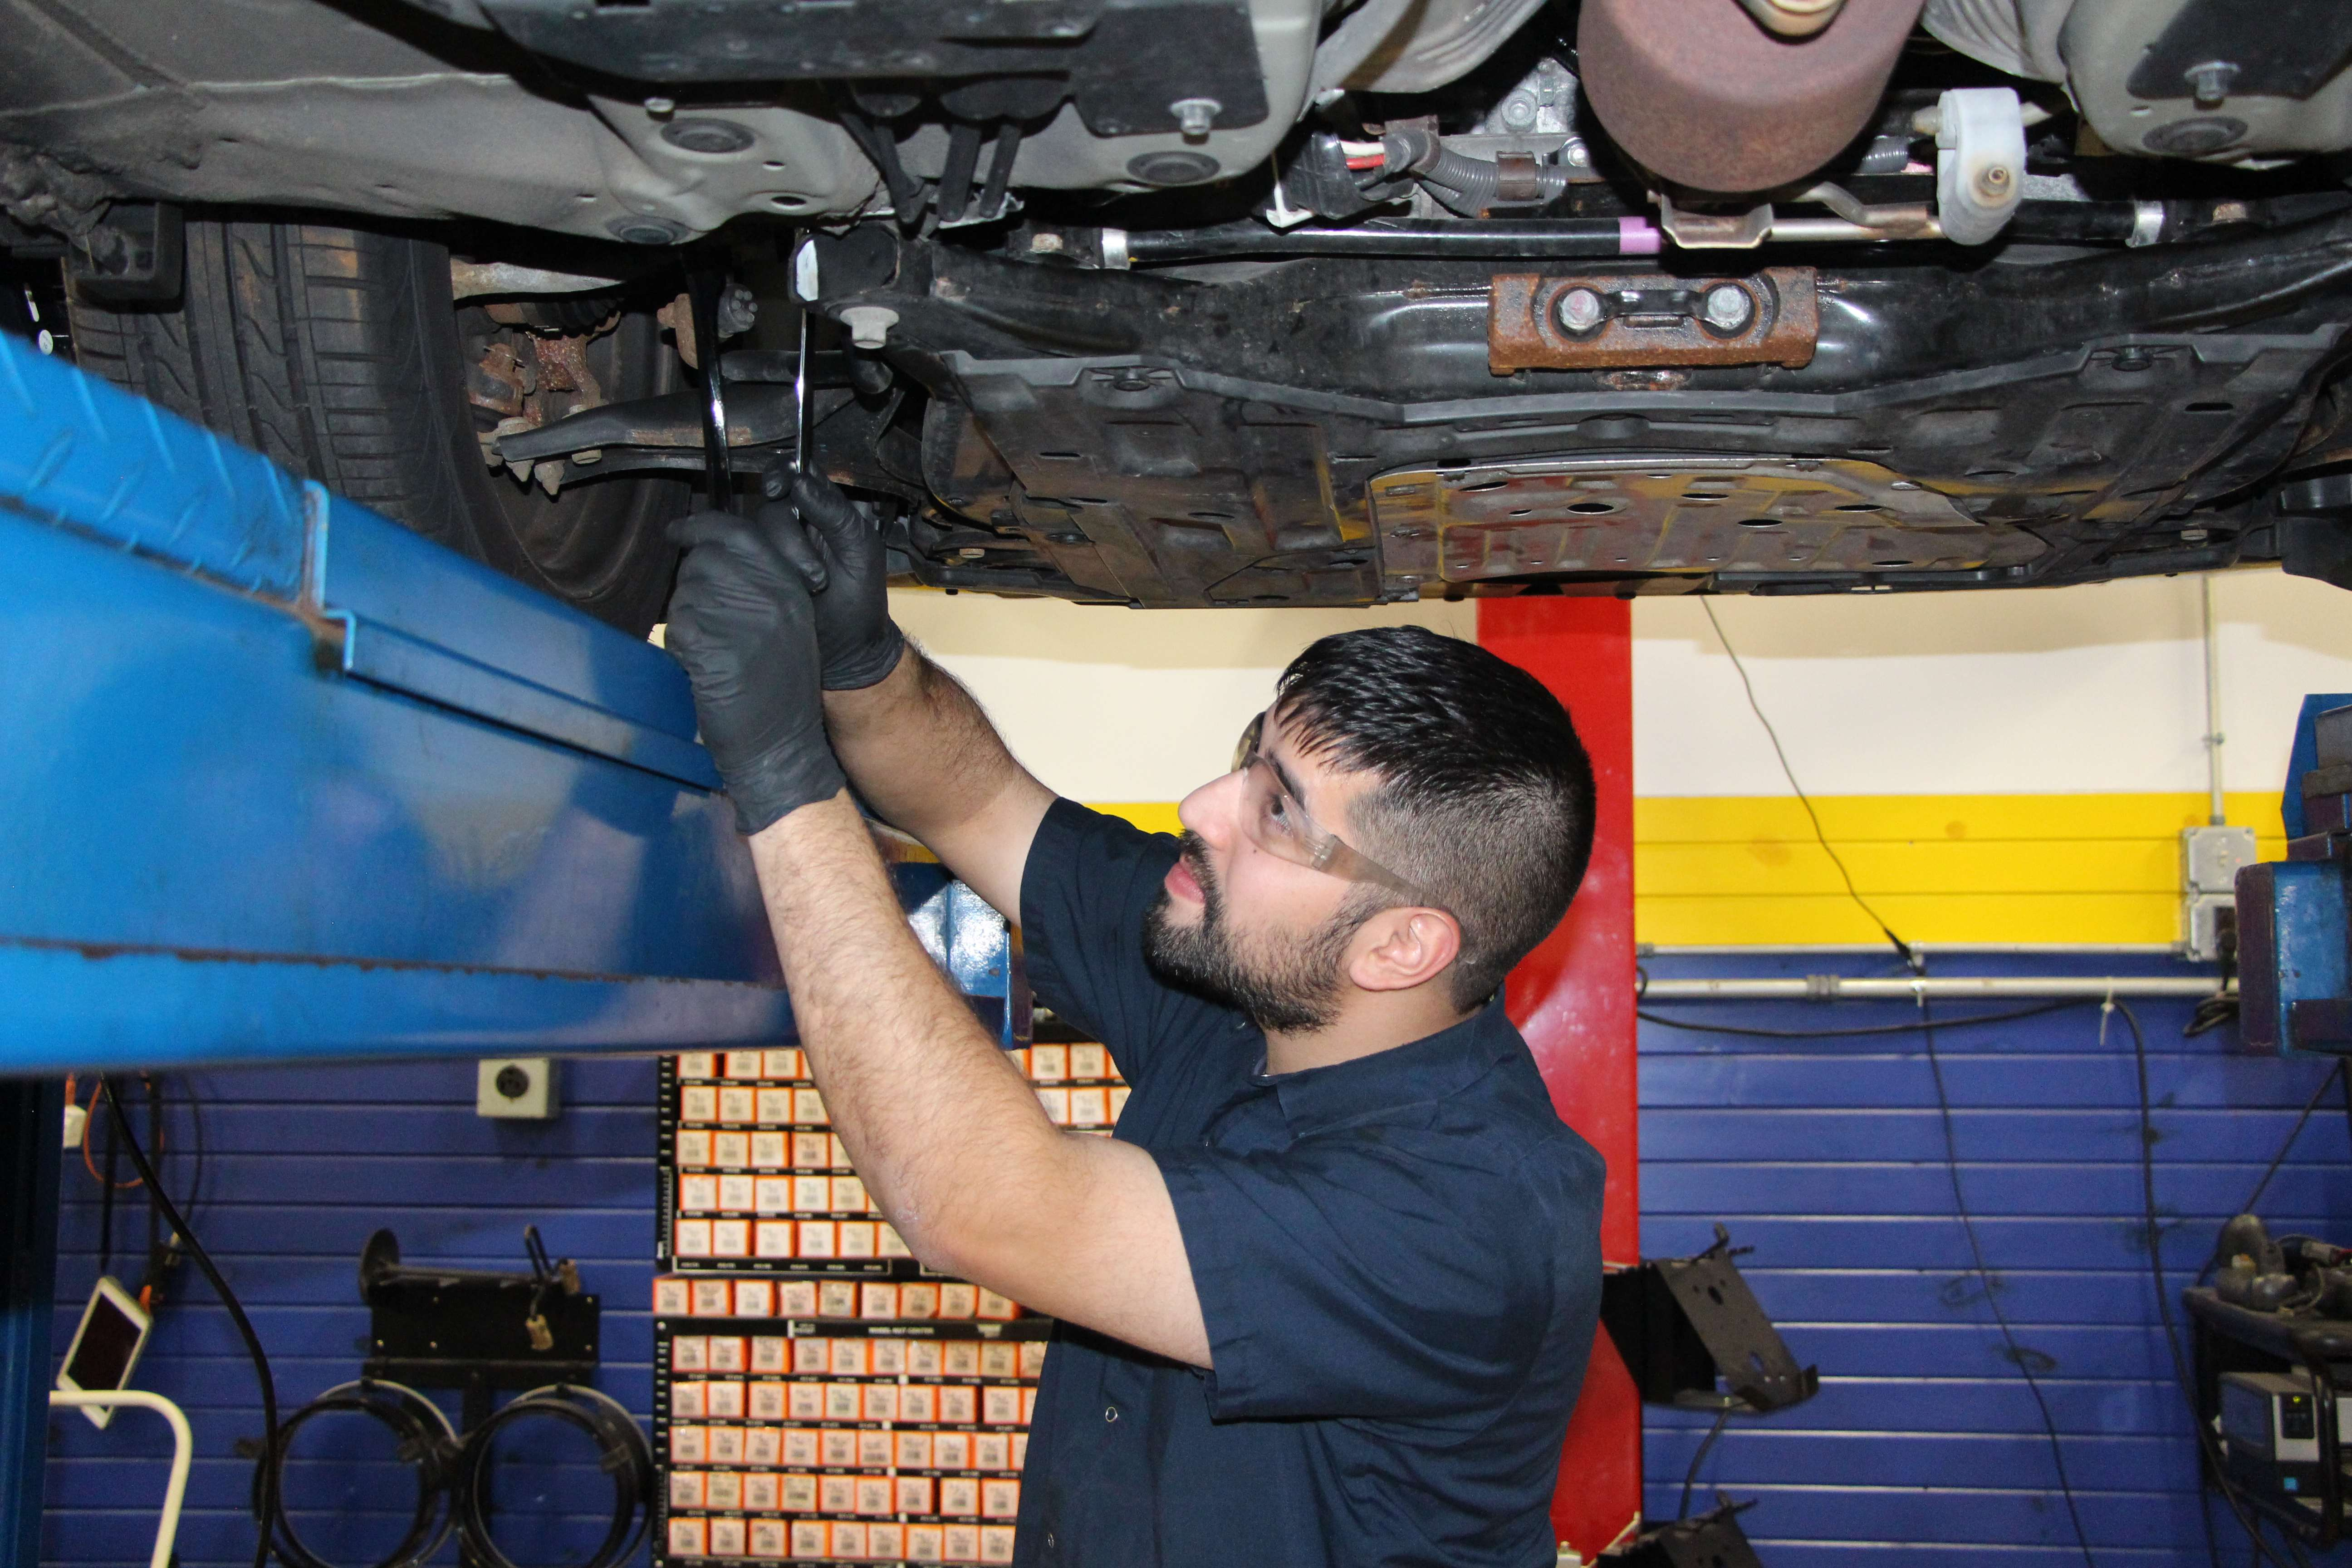 Pretige Motor Works repair & service